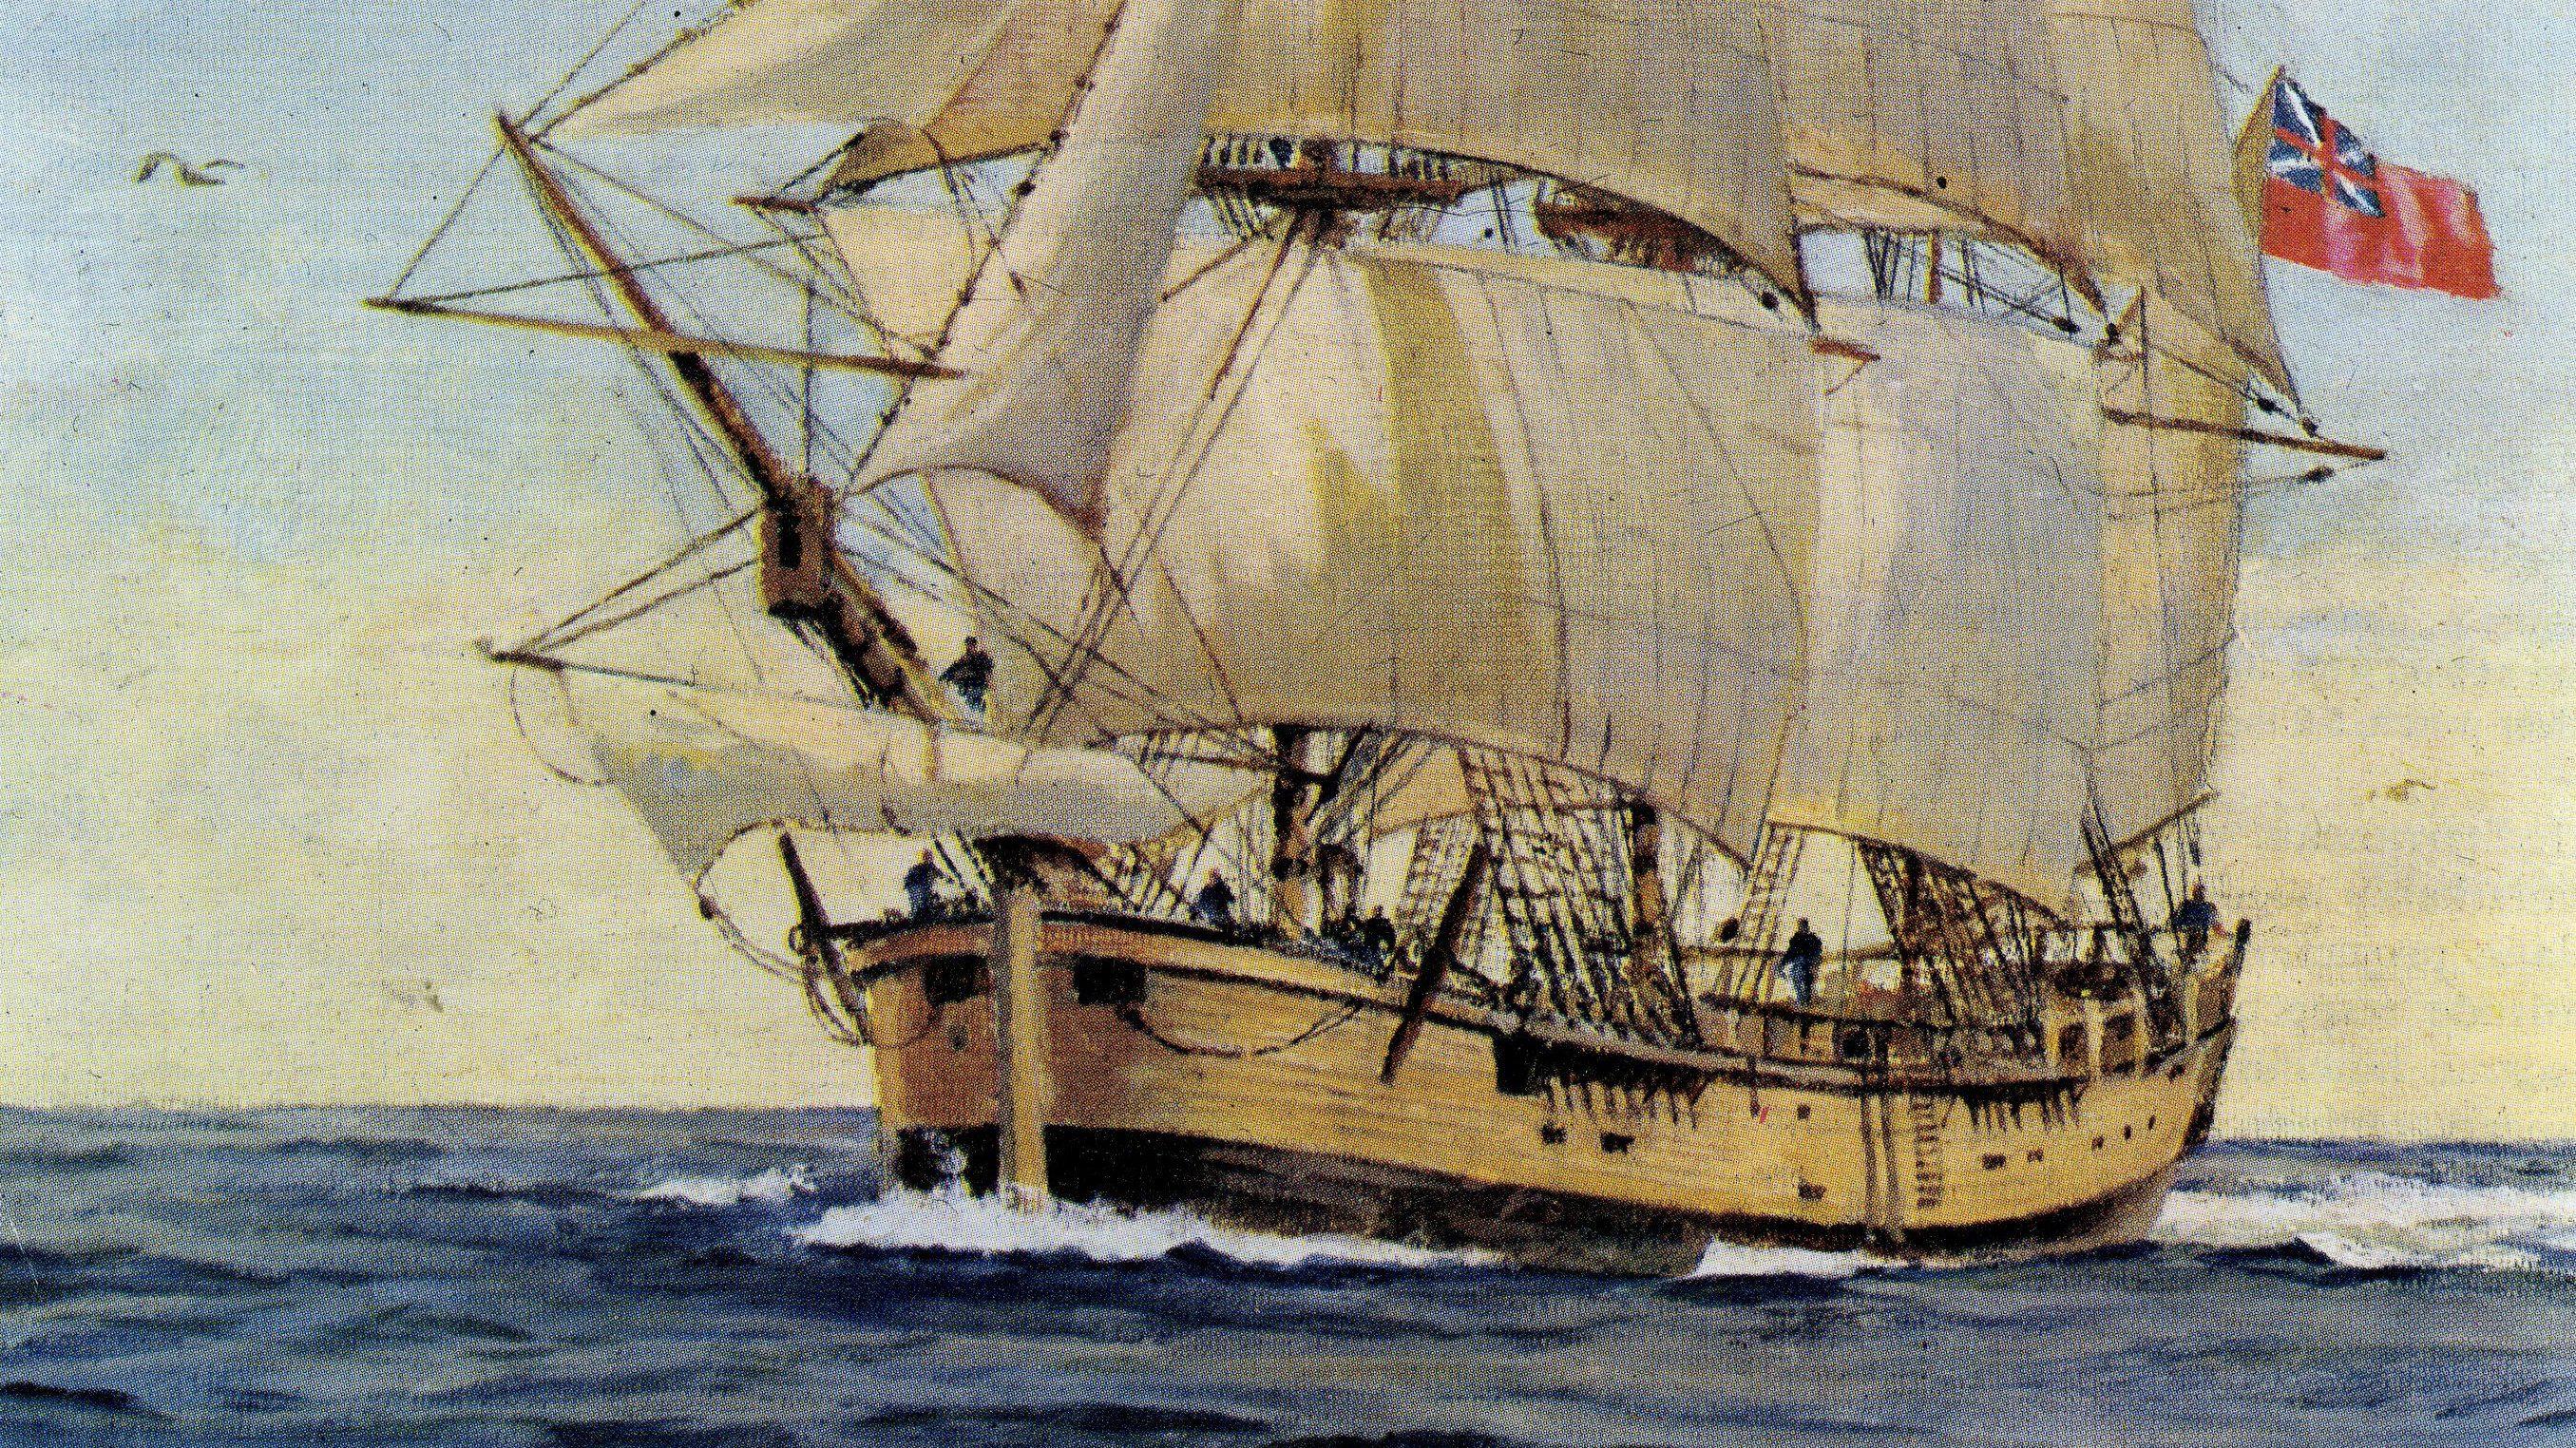 Captain Cook's HMS Endeavour possibly found in US — Quartz